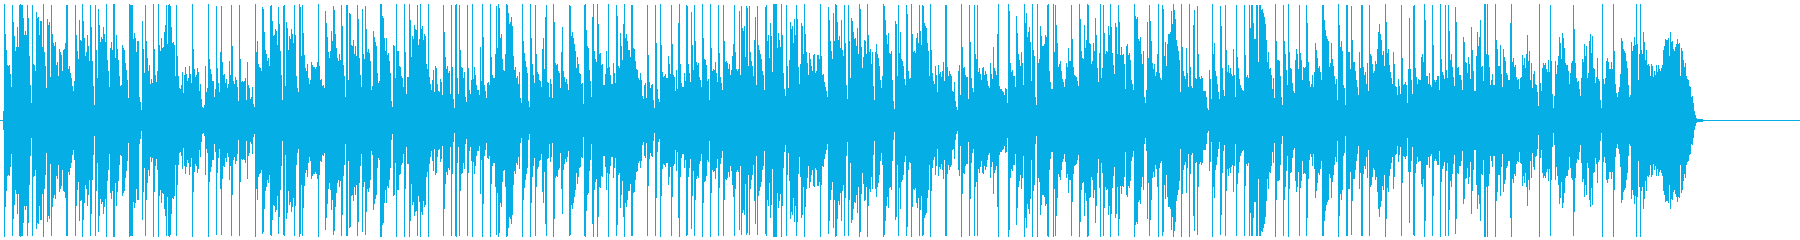 CM用3、口笛とウクレレ、可愛いキッズAの再生済みの波形